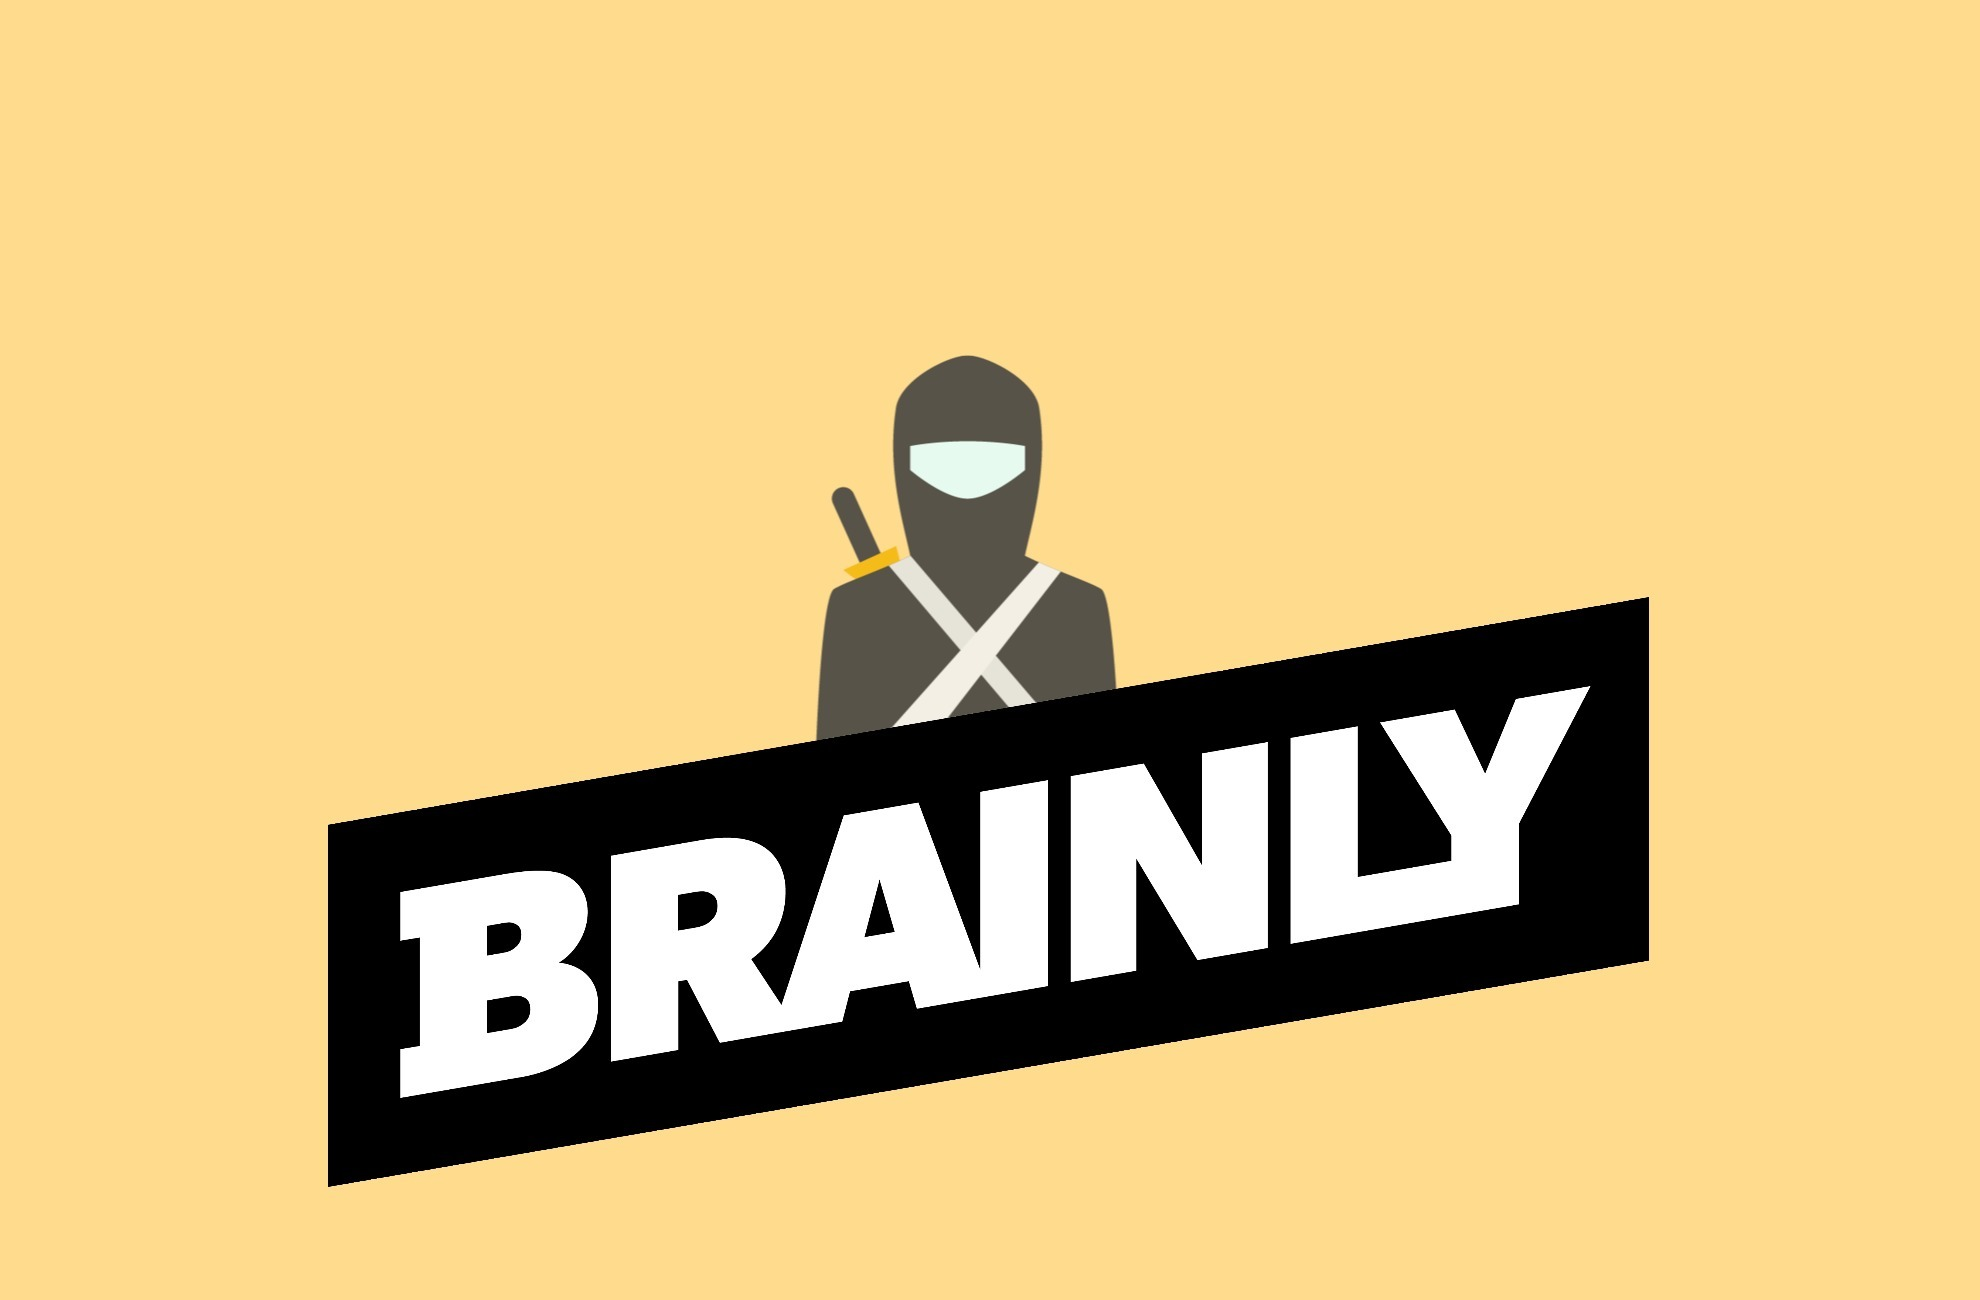 2 Contoh Sikap Sesuai Sila Ke 5 Pancasila Brainly Co Id